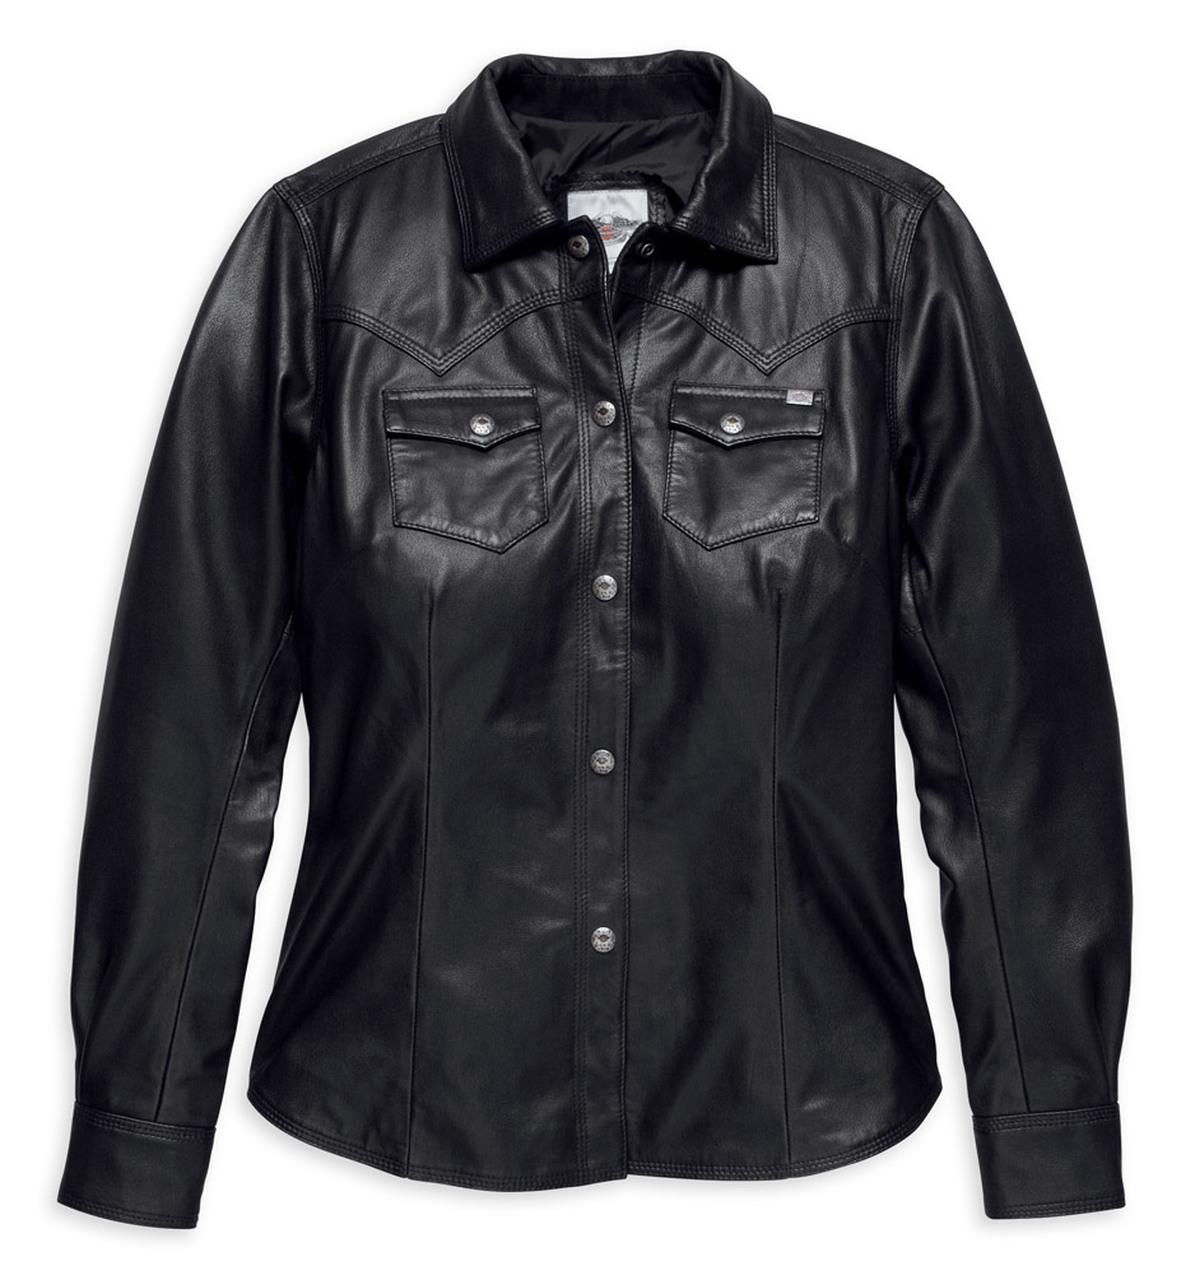 Harley-Davidson® Women's Melrose Light Leather Shirt Jacket, Black